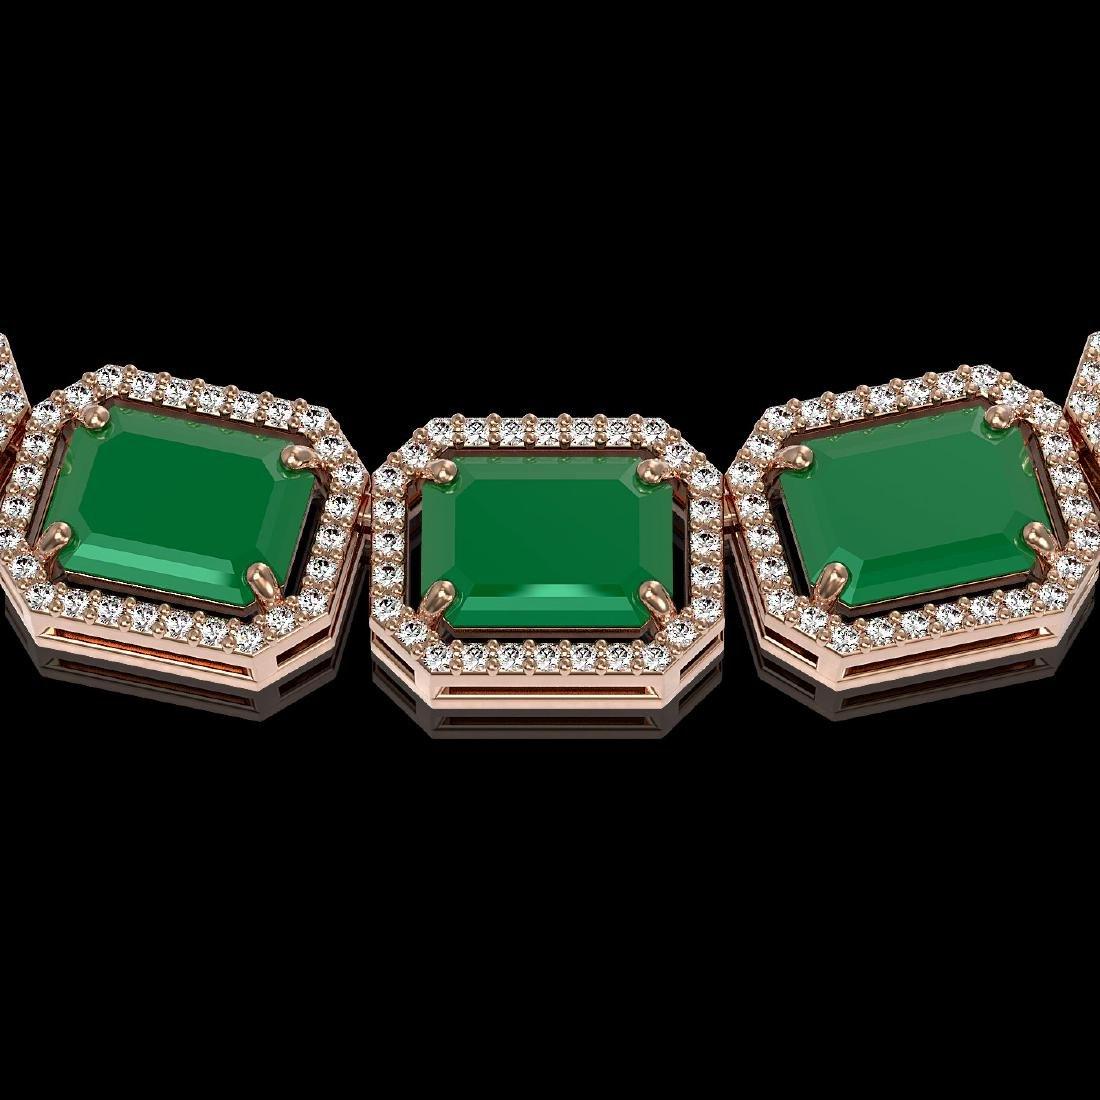 84.94 CTW Emerald & Diamond Halo Necklace 10K Rose Gold - 3